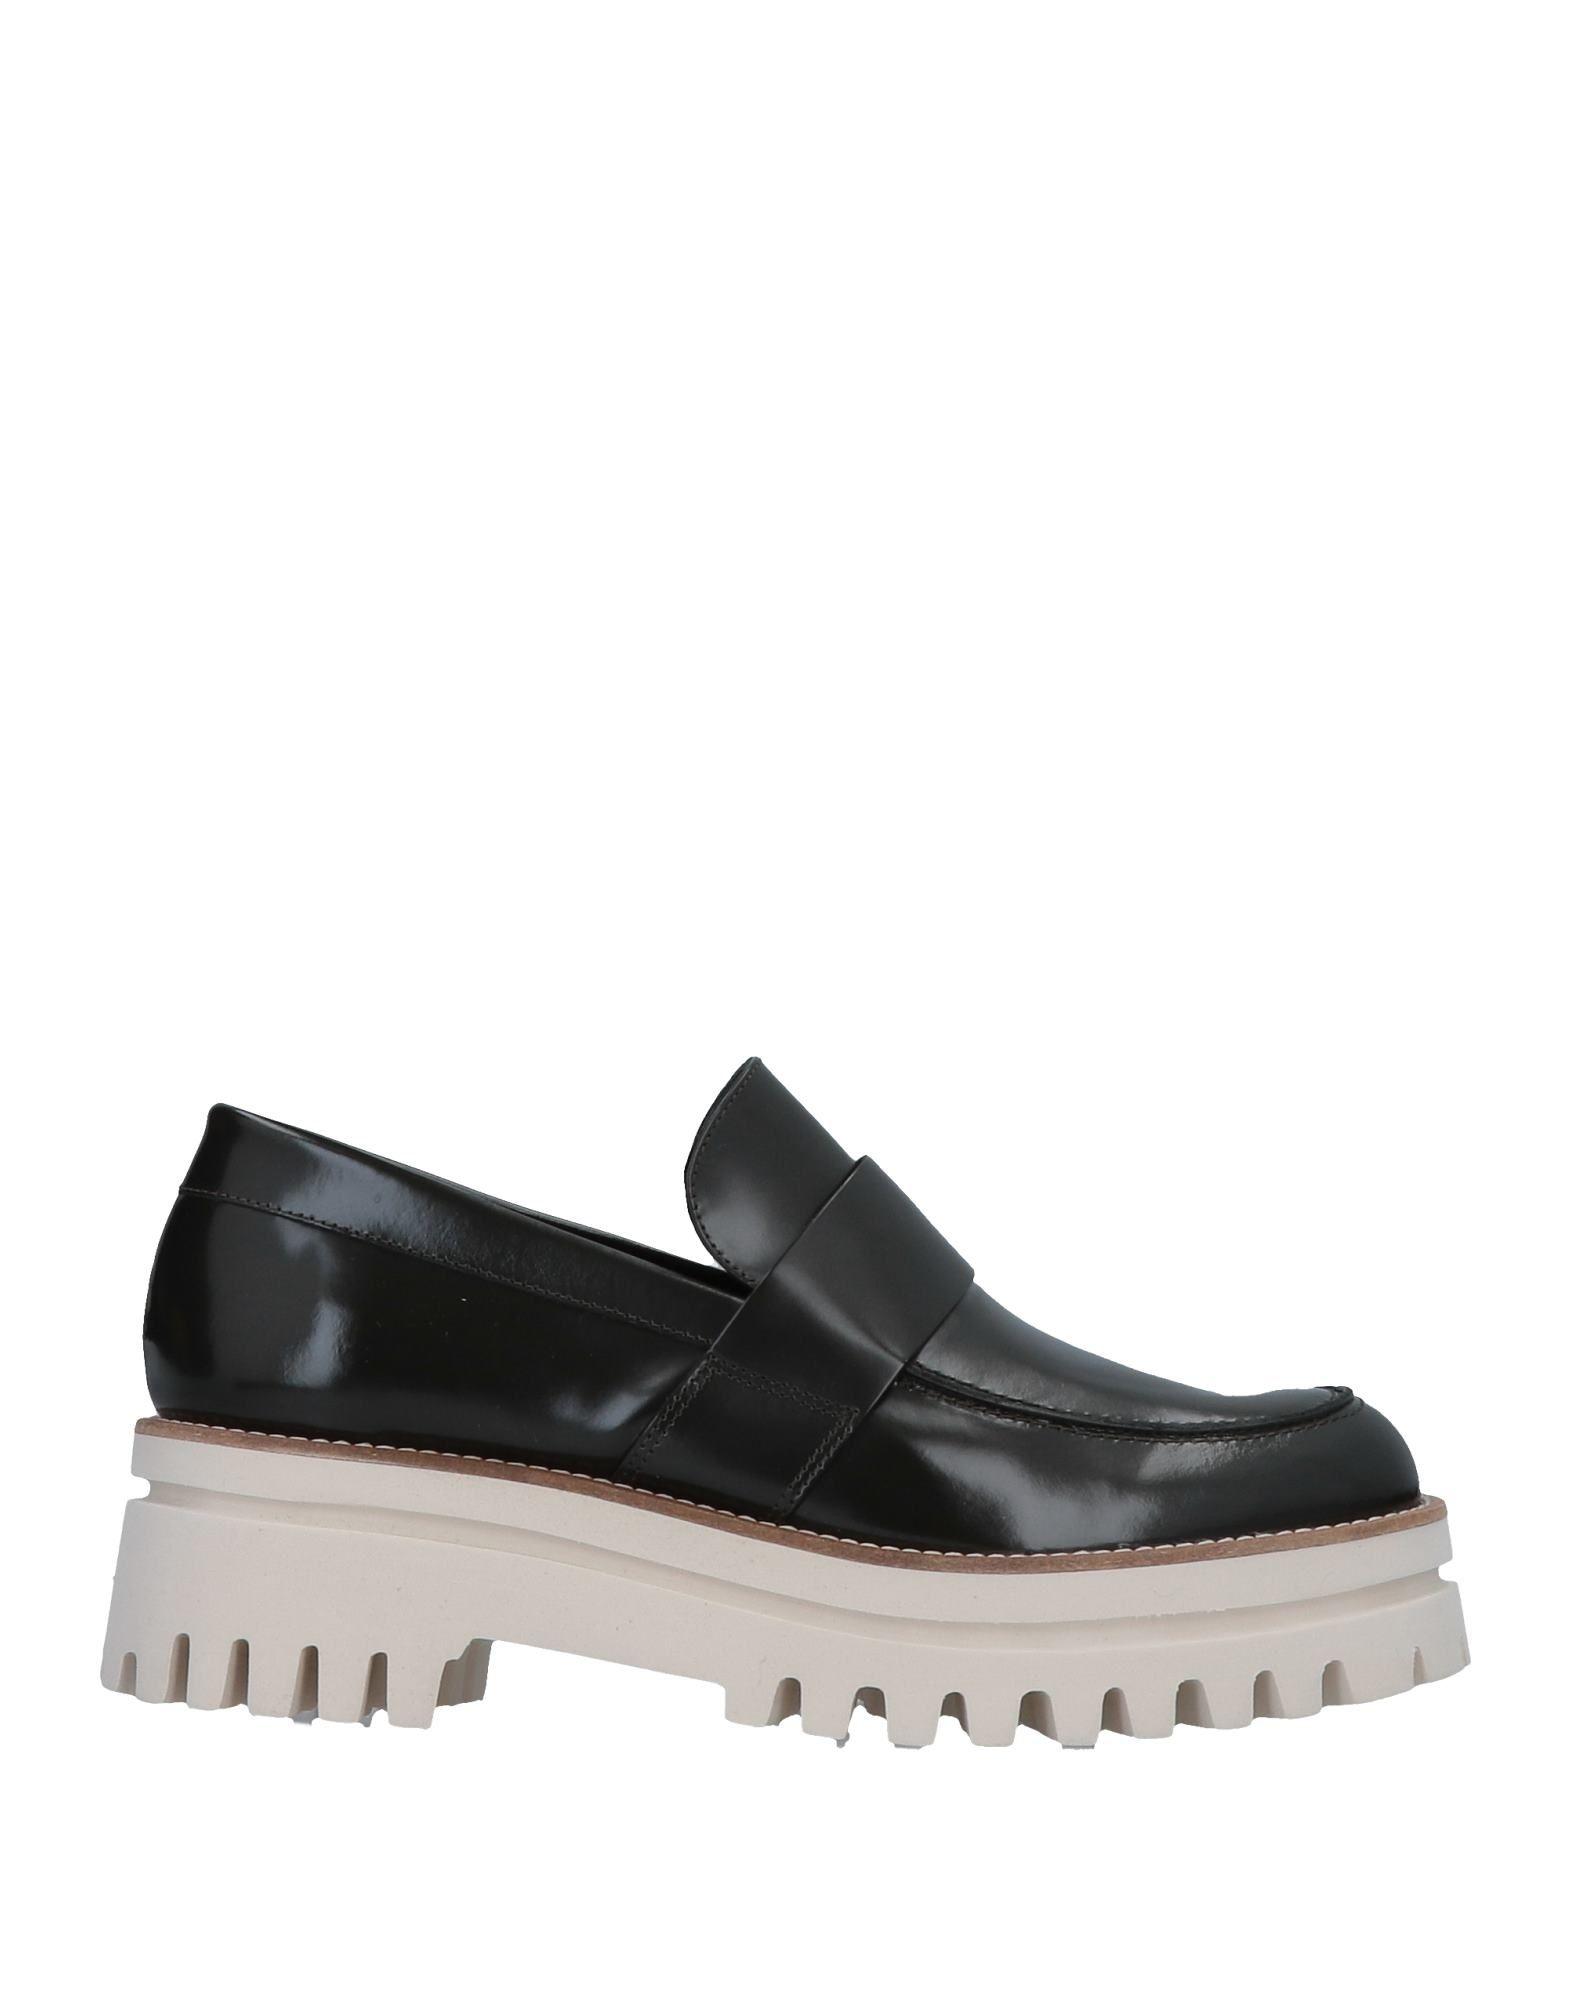 Stilvolle billige Schuhe Paloma Barceló Mokassins Mokassins Mokassins Damen  11512988WJ d43614